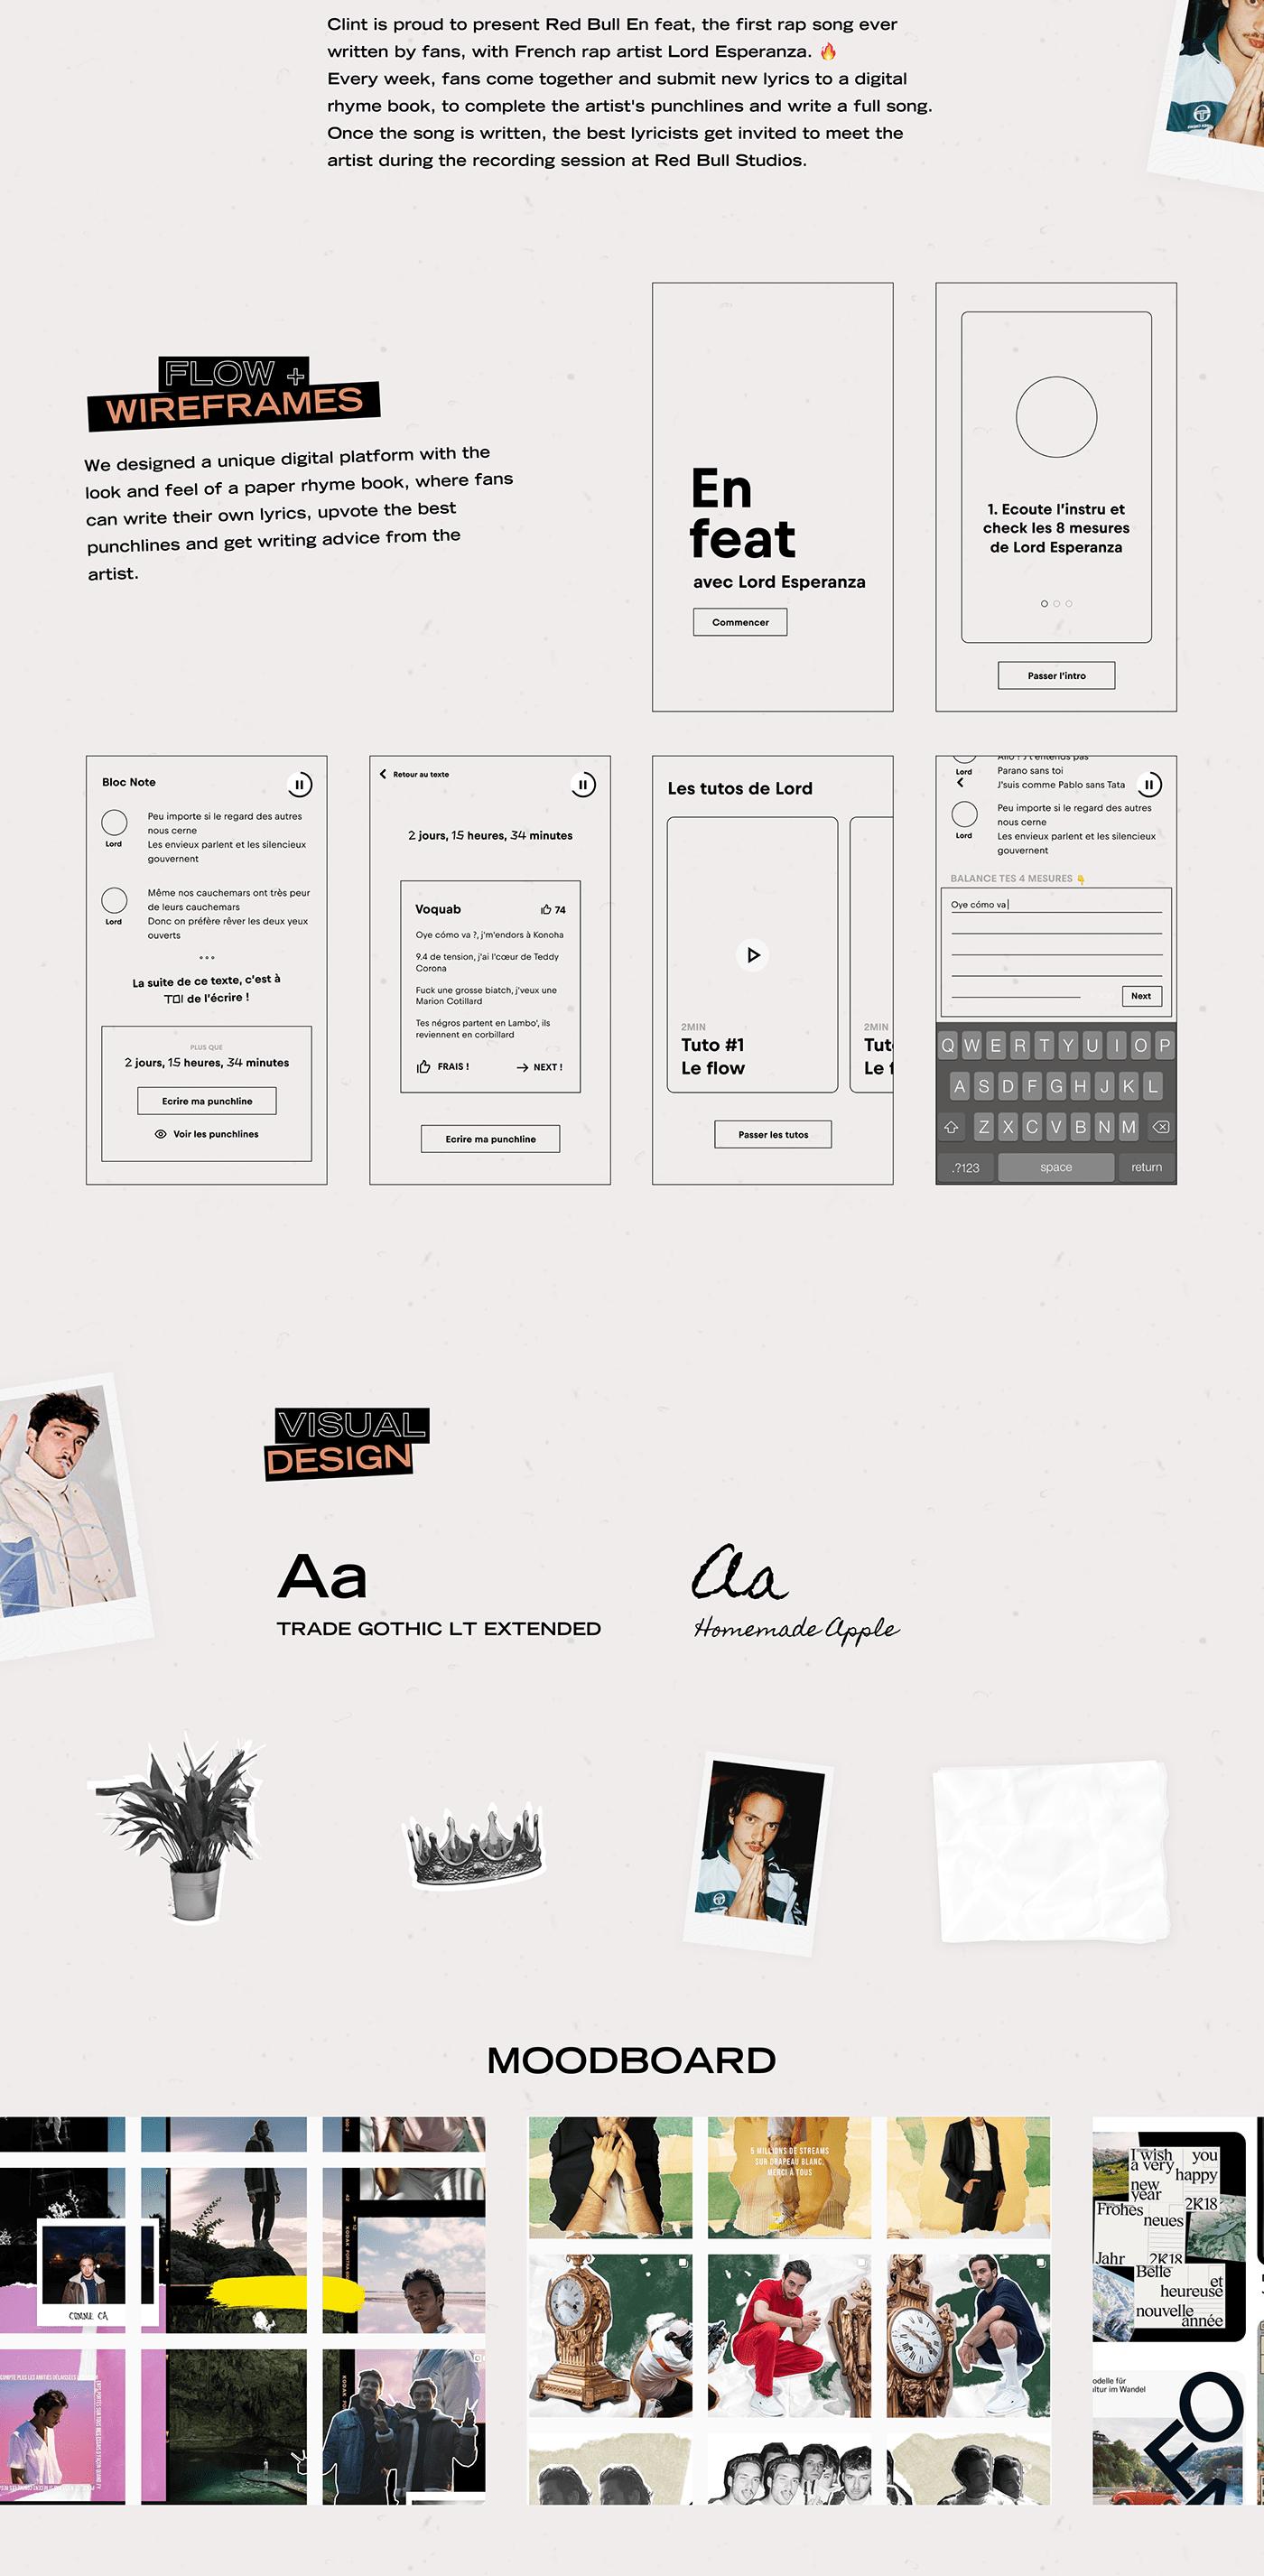 animation  featuring Lord Esperanza rap Collaboration contest design Interface